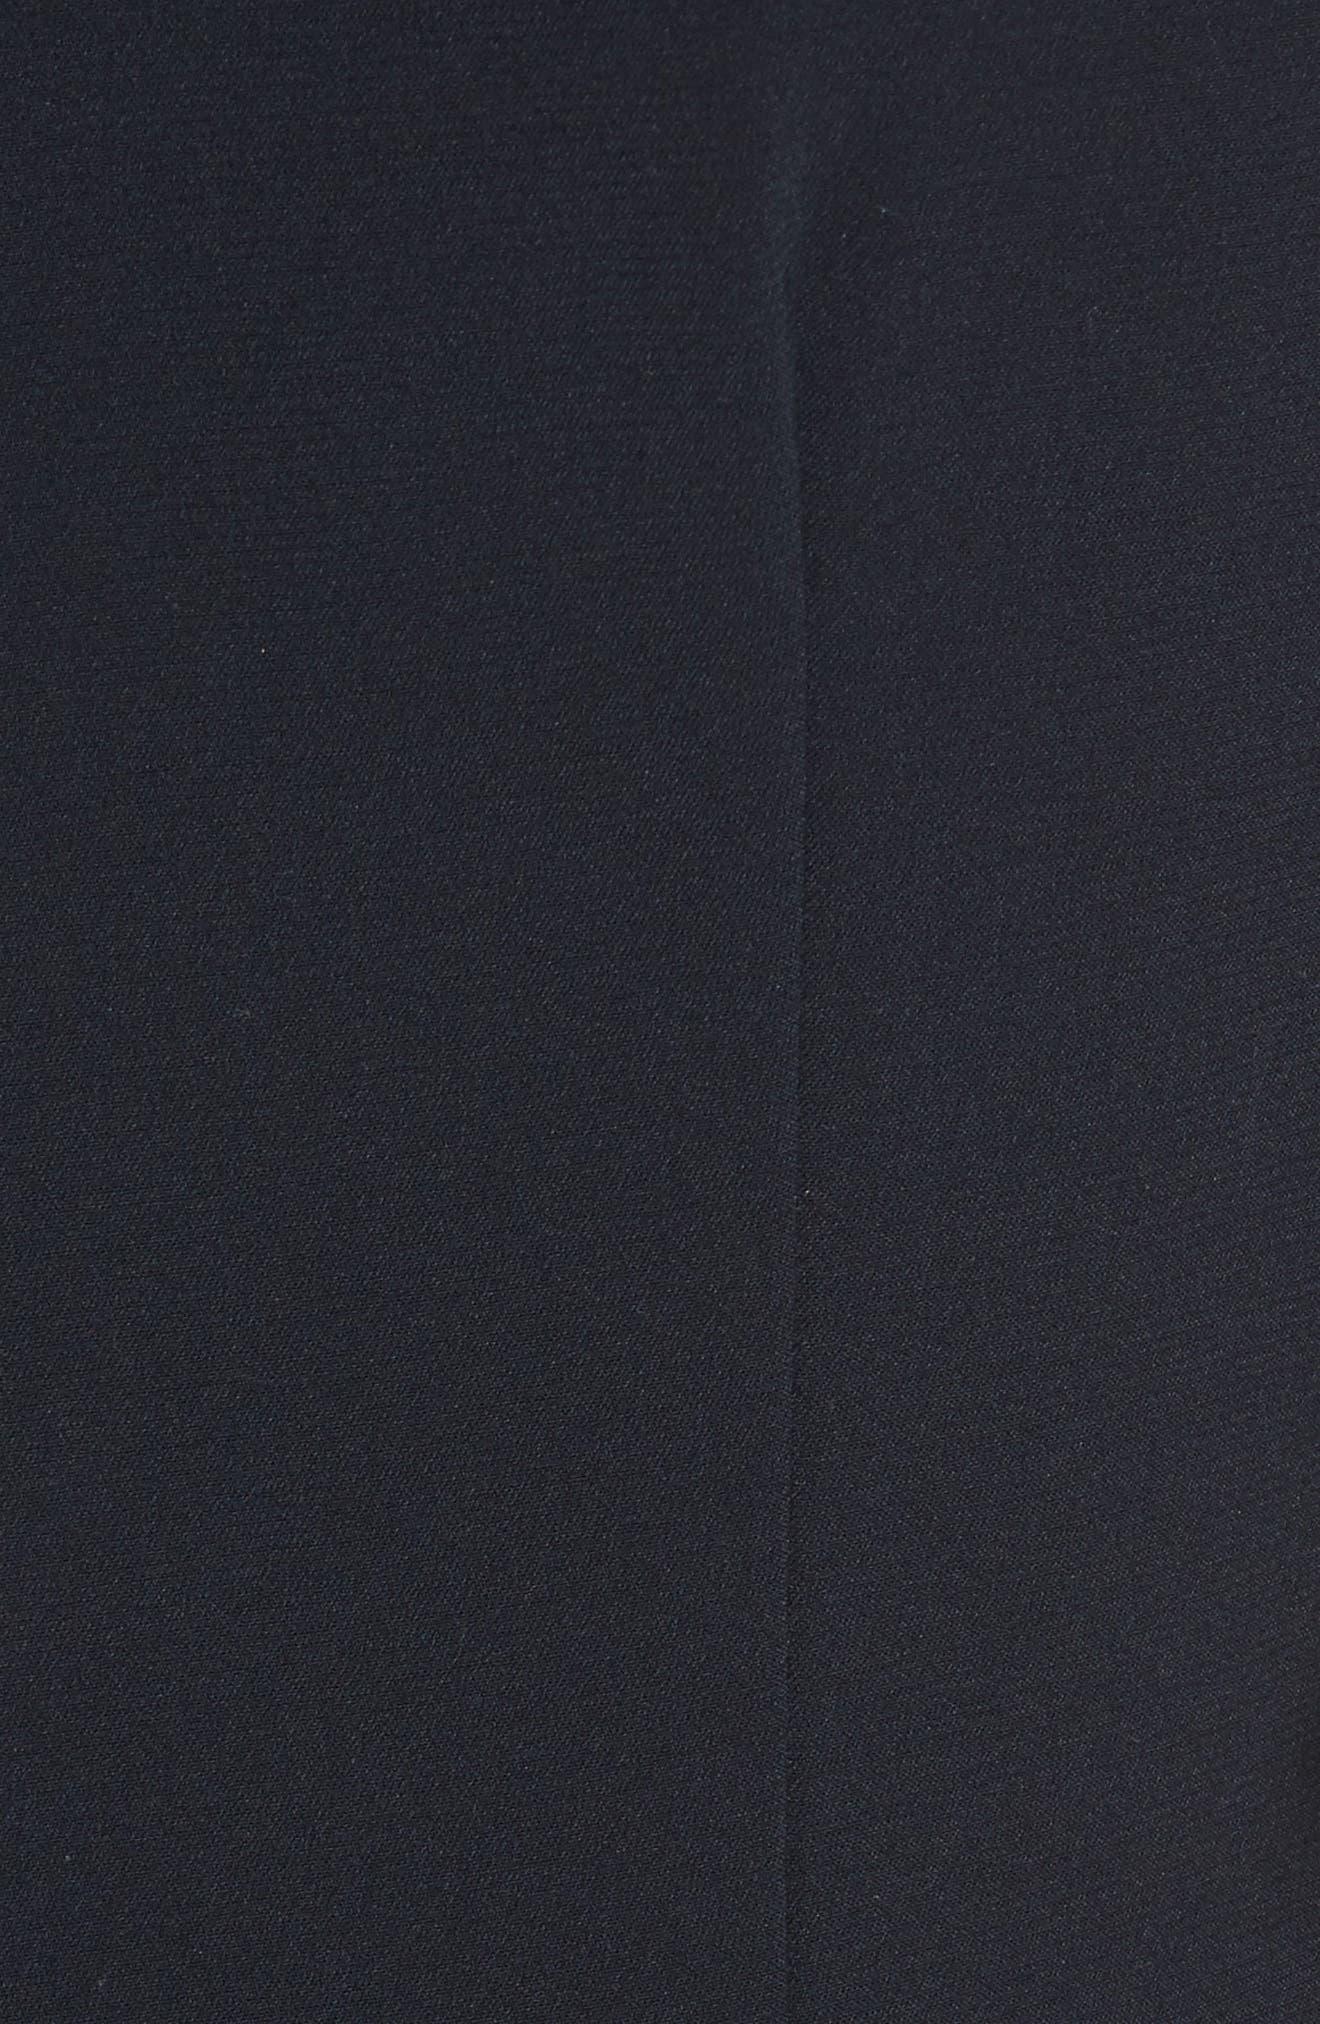 Fringe Flare Hem Sheath Dress,                             Alternate thumbnail 5, color,                             Navy